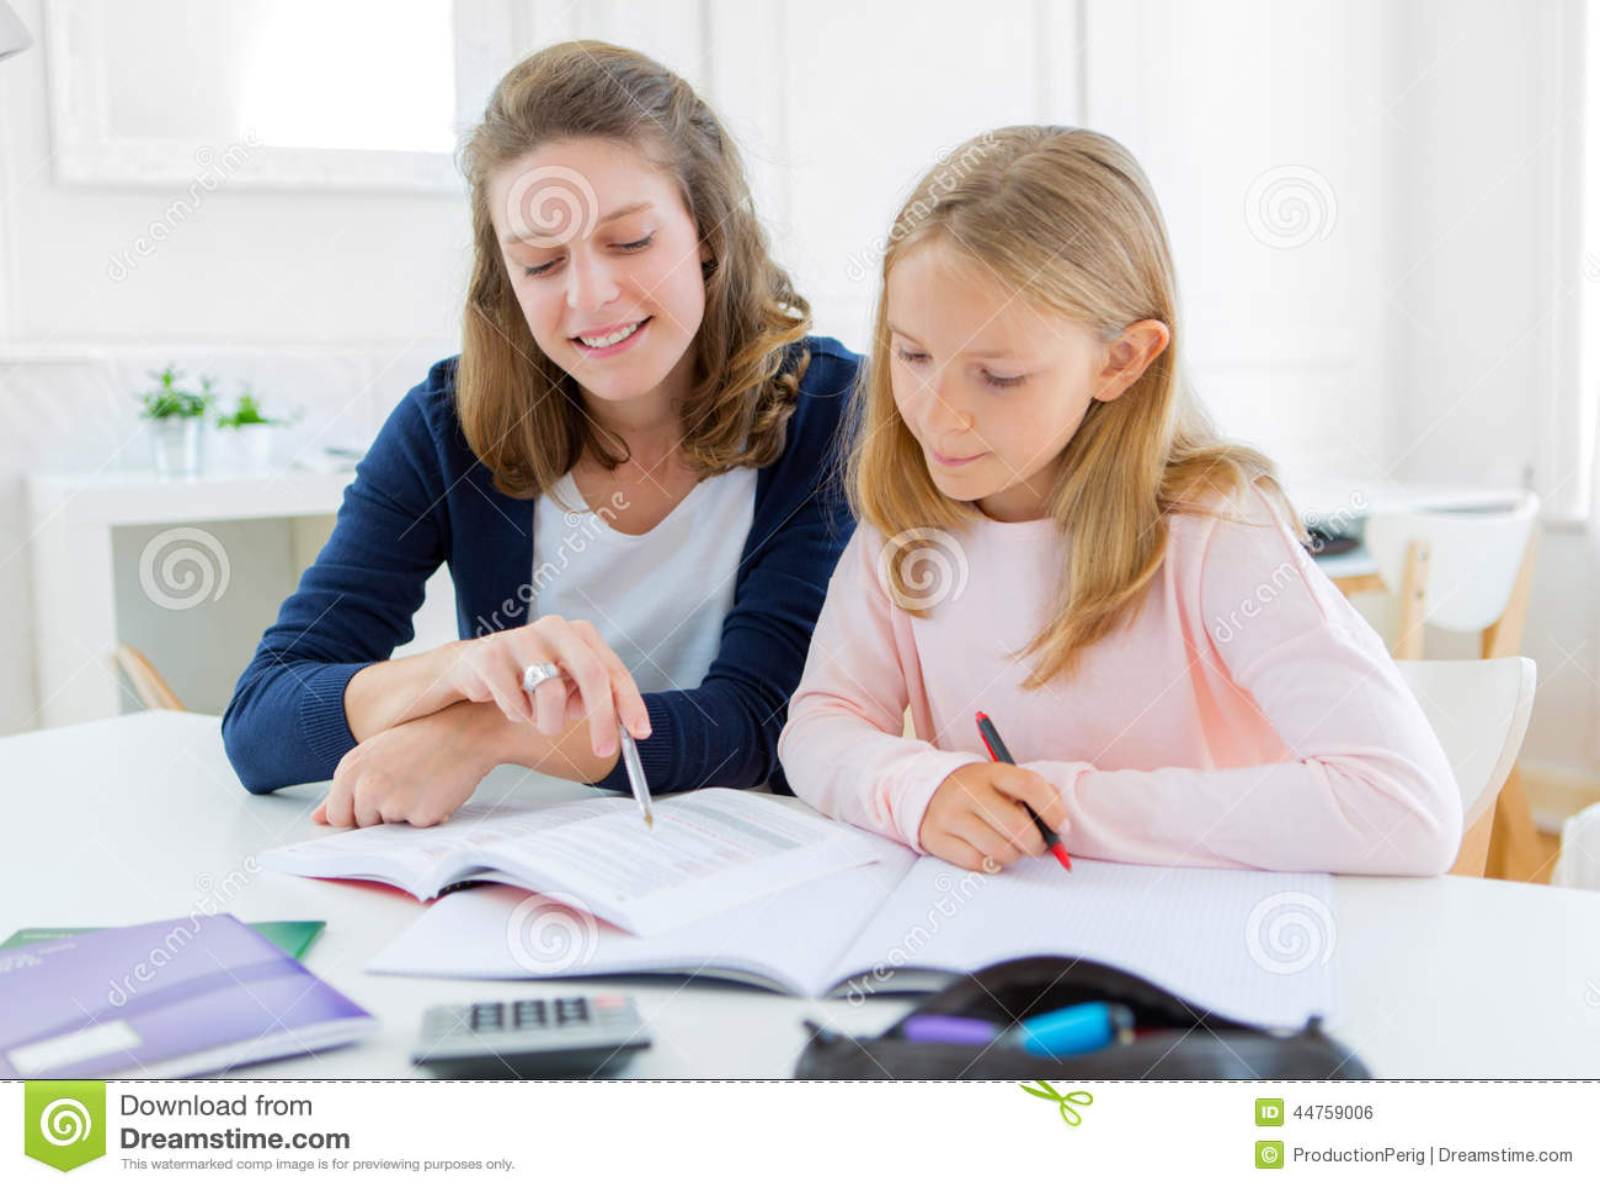 Helping homework